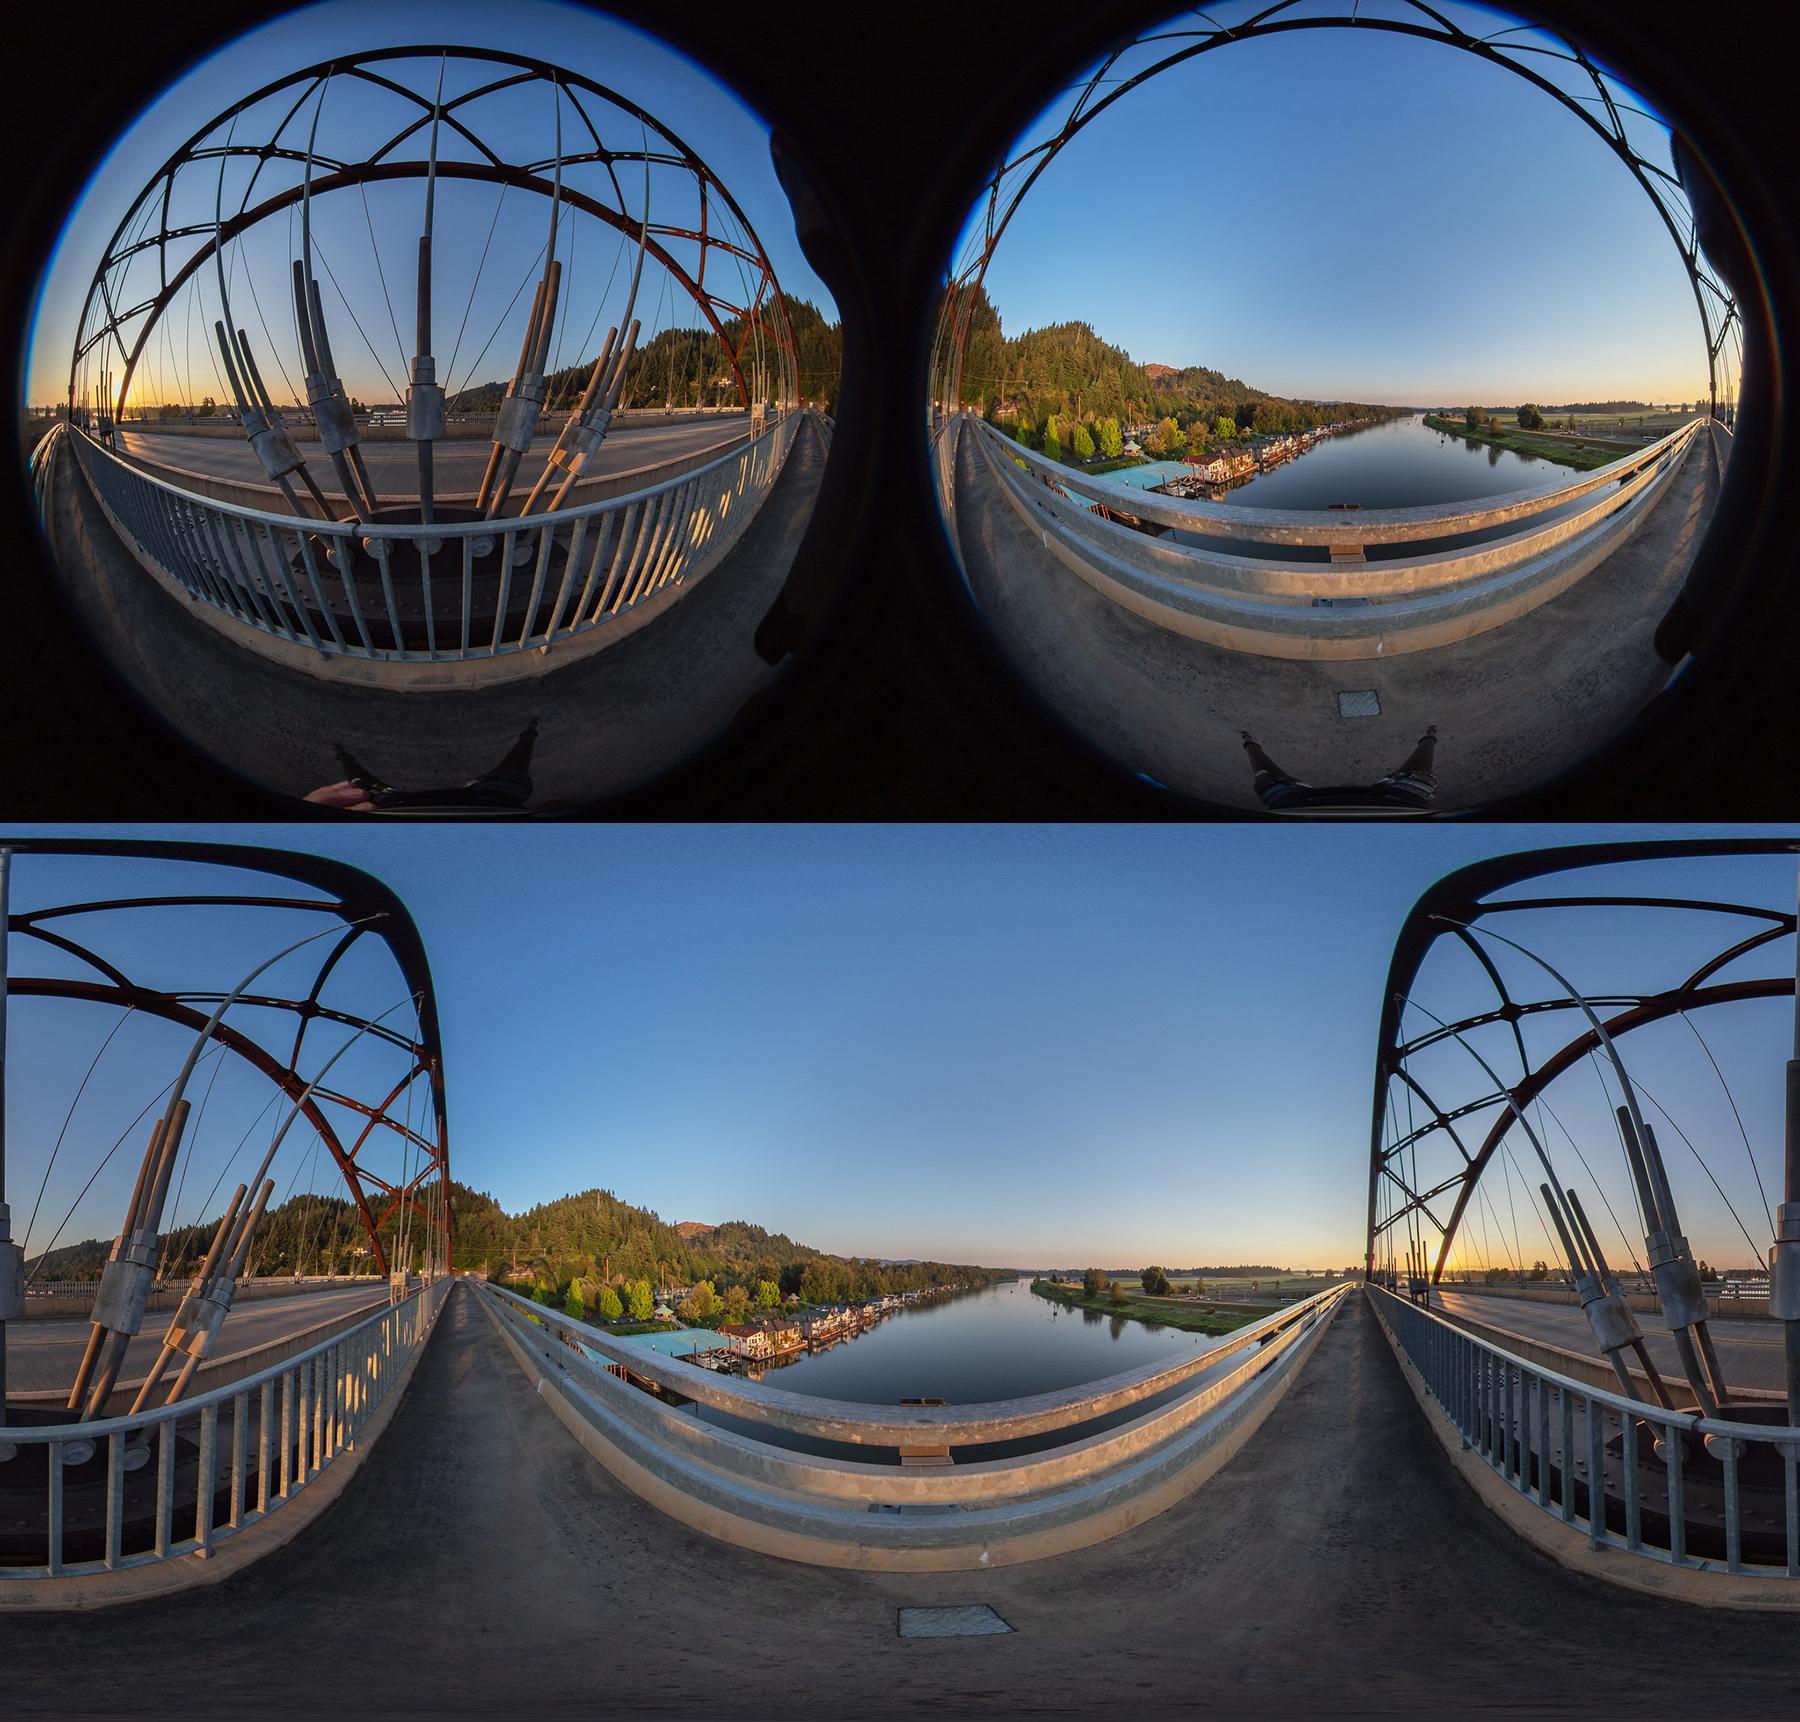 Hyper-wide 210° fisheye – Laowa 4mm f/2.8 Circular Fisheye will blow your mind | Digital Camera World